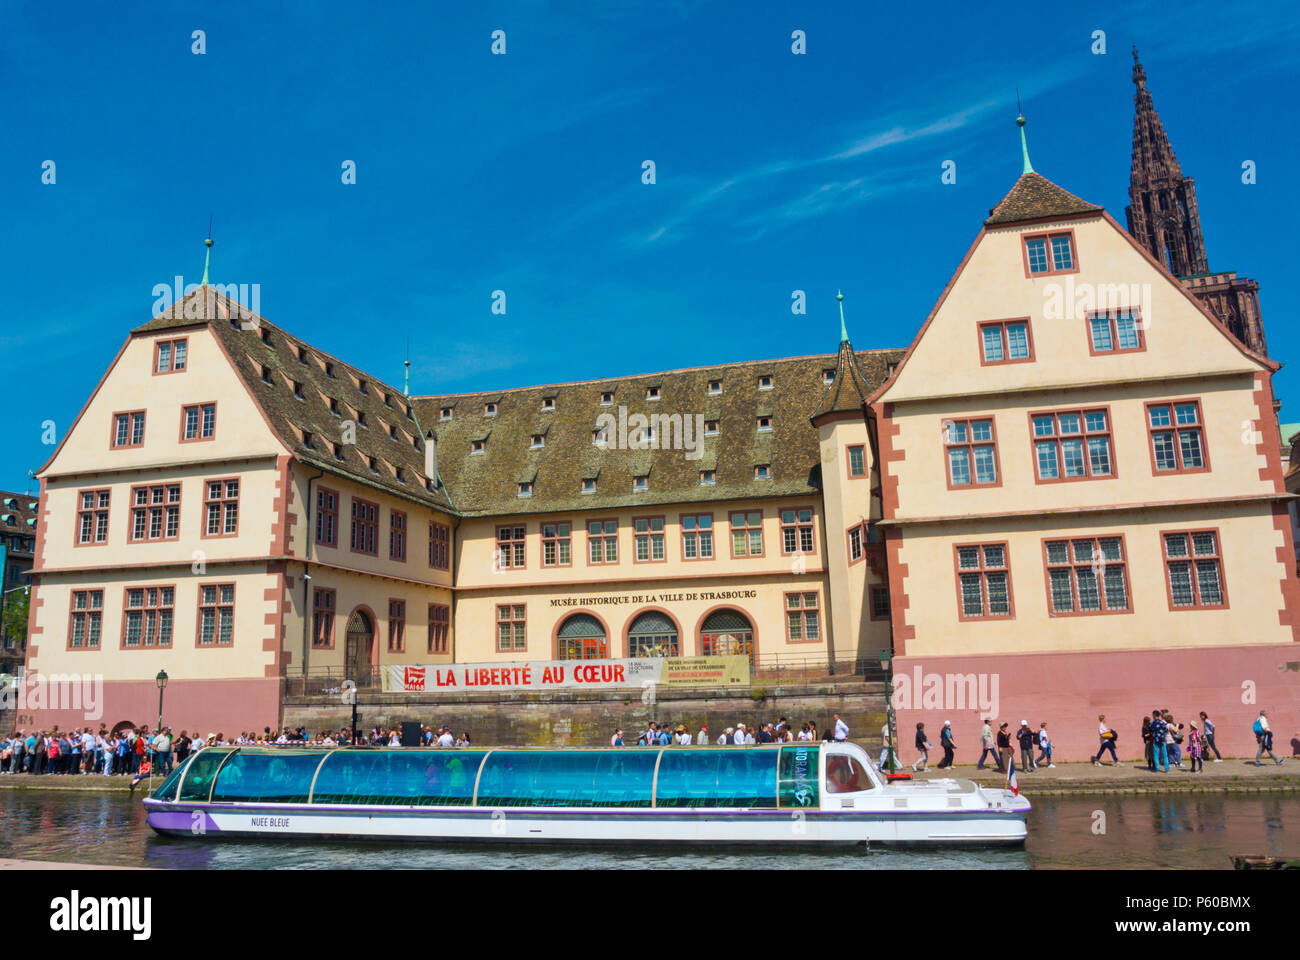 Pier Batorama Rohan Palace, by River Ill, Grande Ile, Strasbourg, Alsace, France - Stock Image